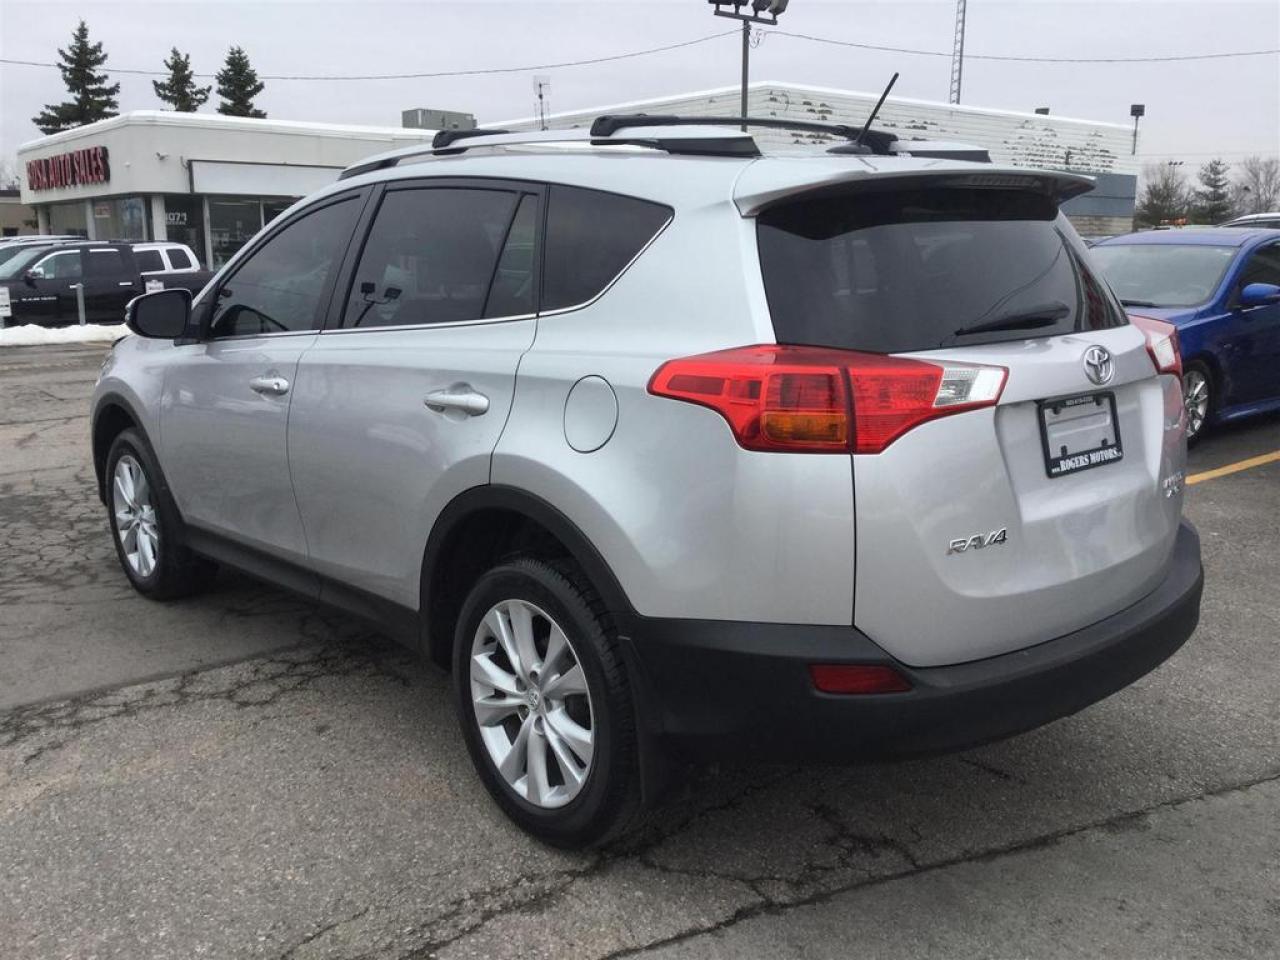 Cars for Sale Under 1000 On Craigslist - 2018 - 2019 New ...